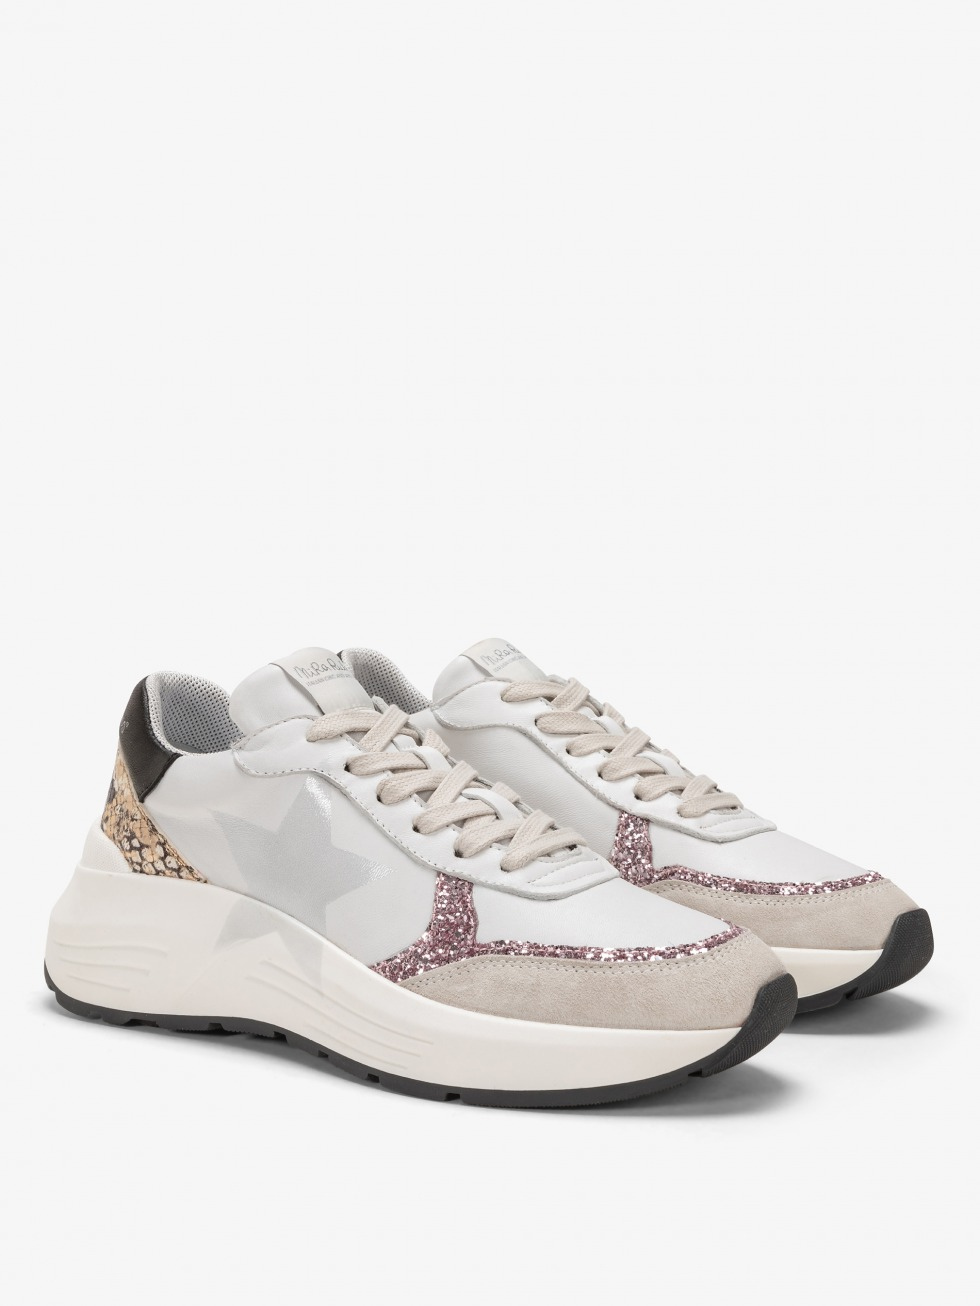 Stinger Chunky Sneakers Python Rose - Star